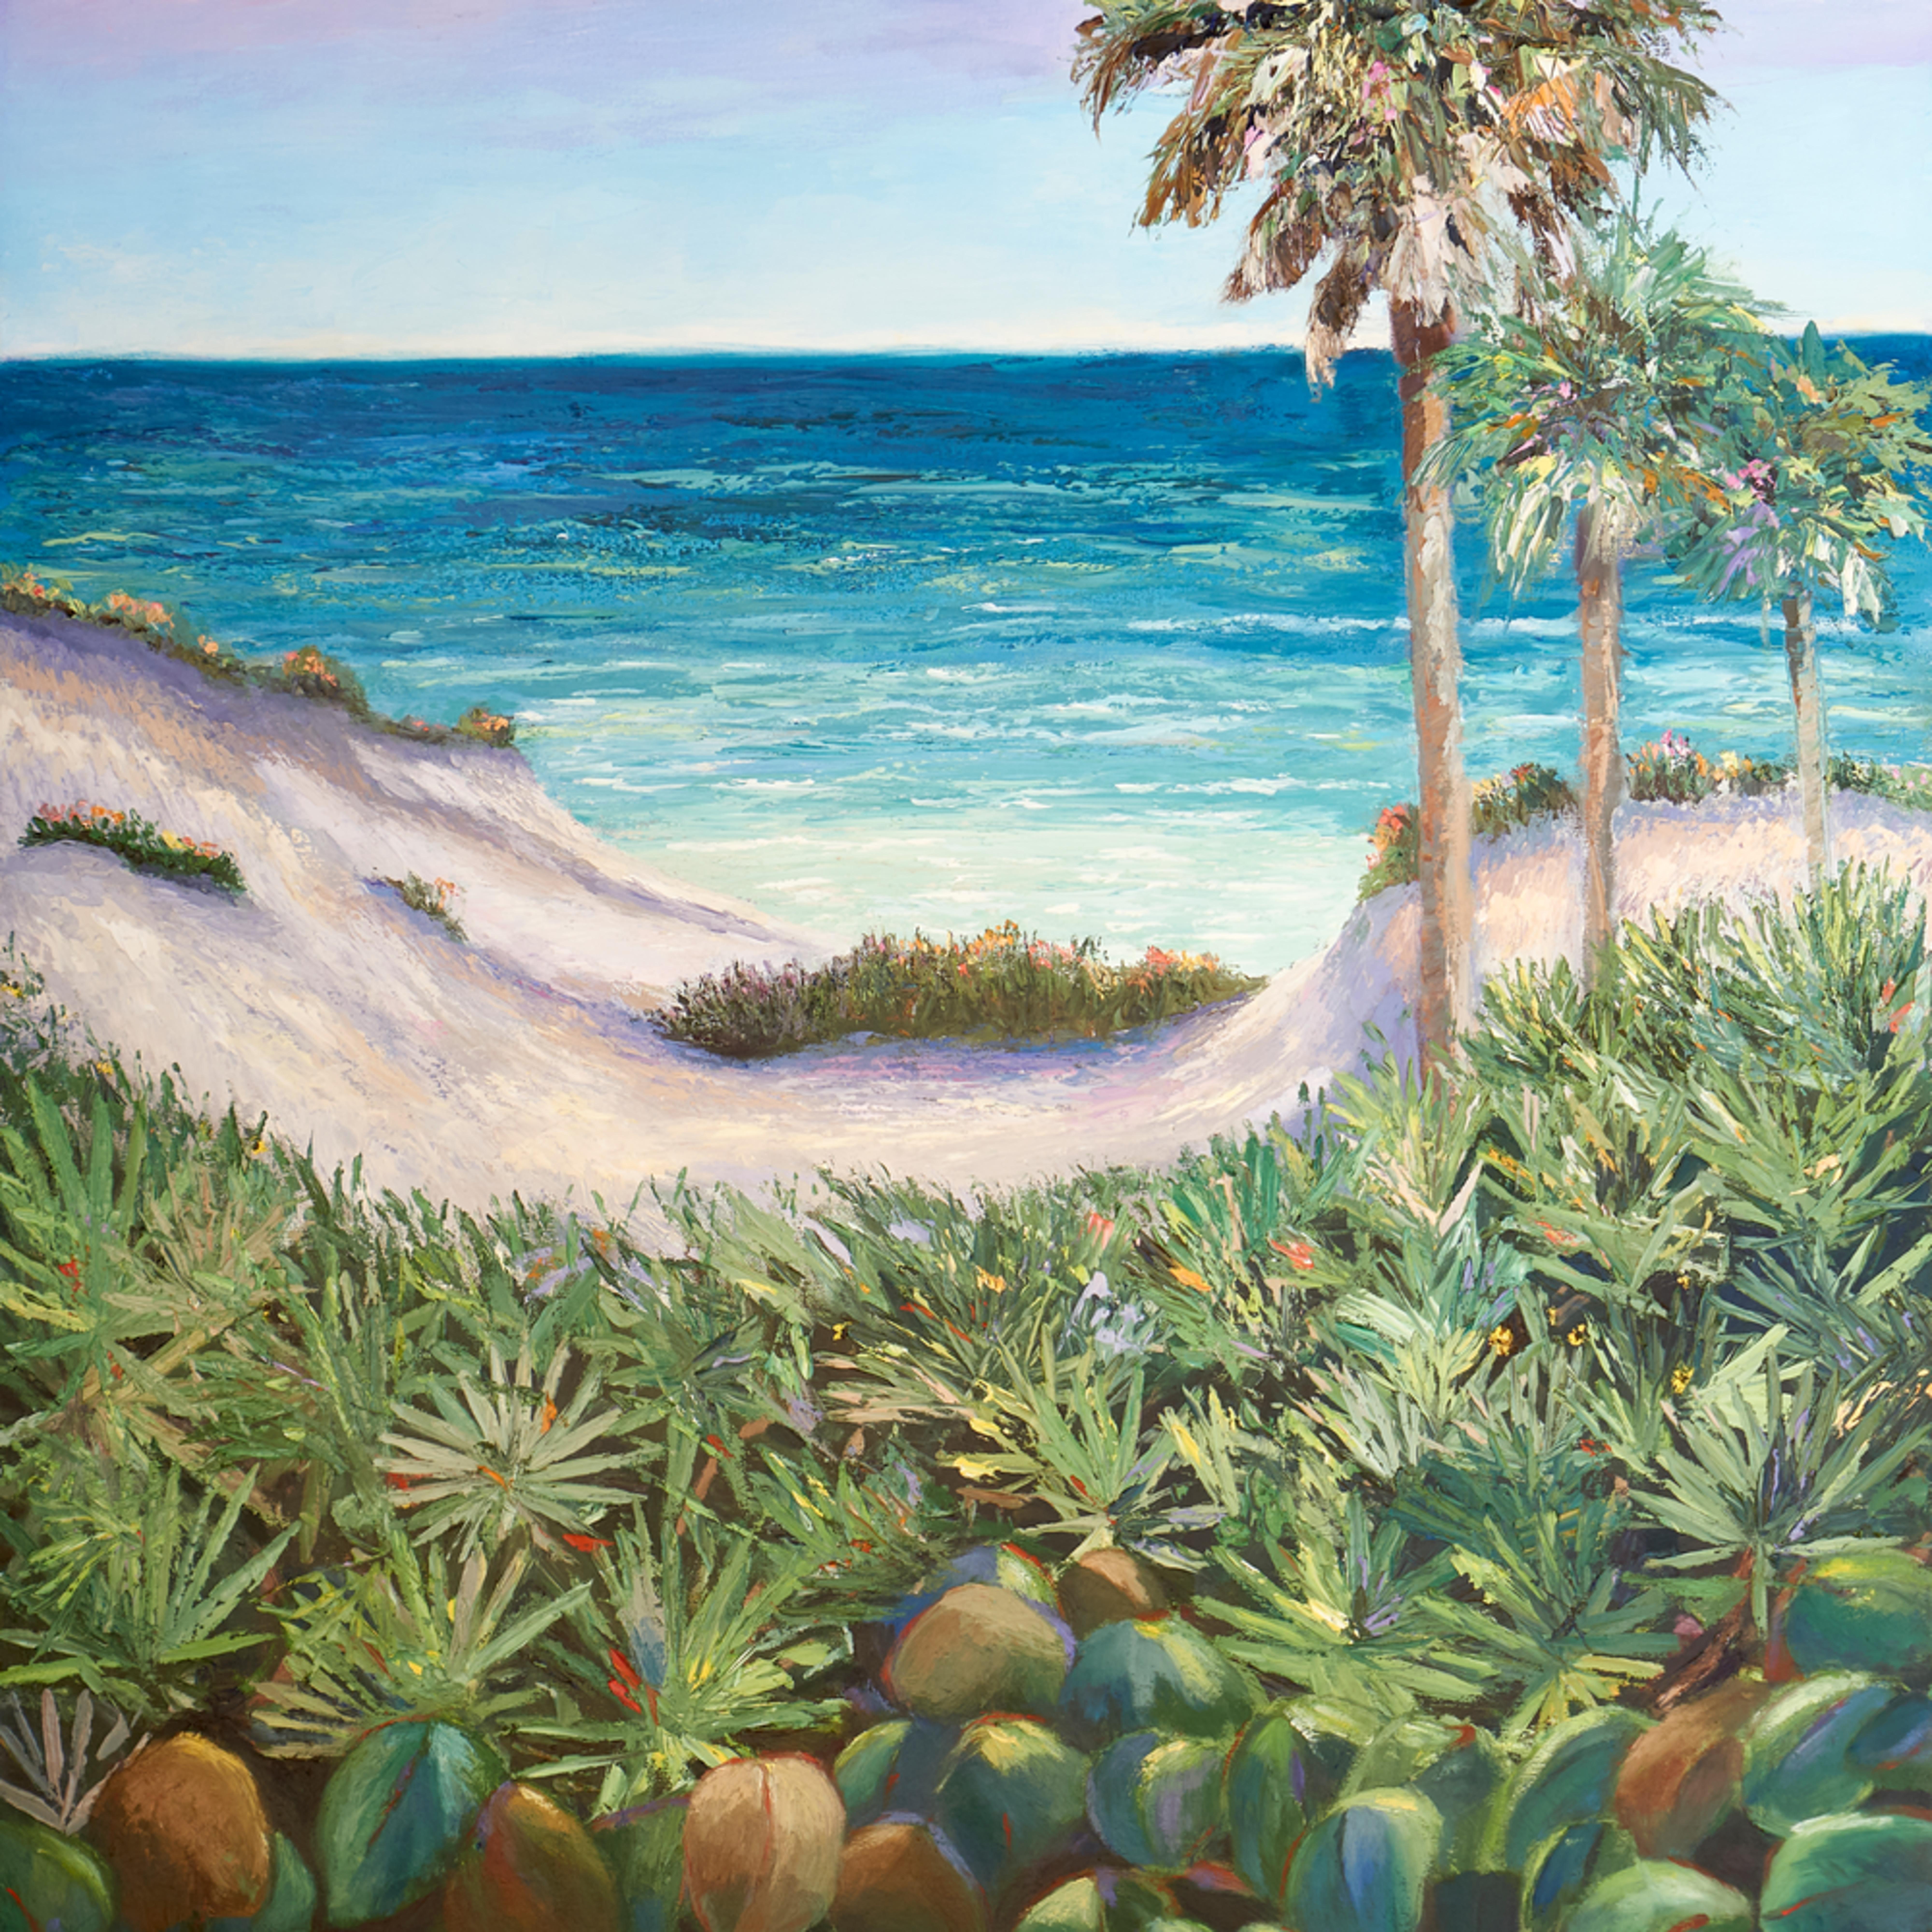 Our florida paradise upscalled waip90